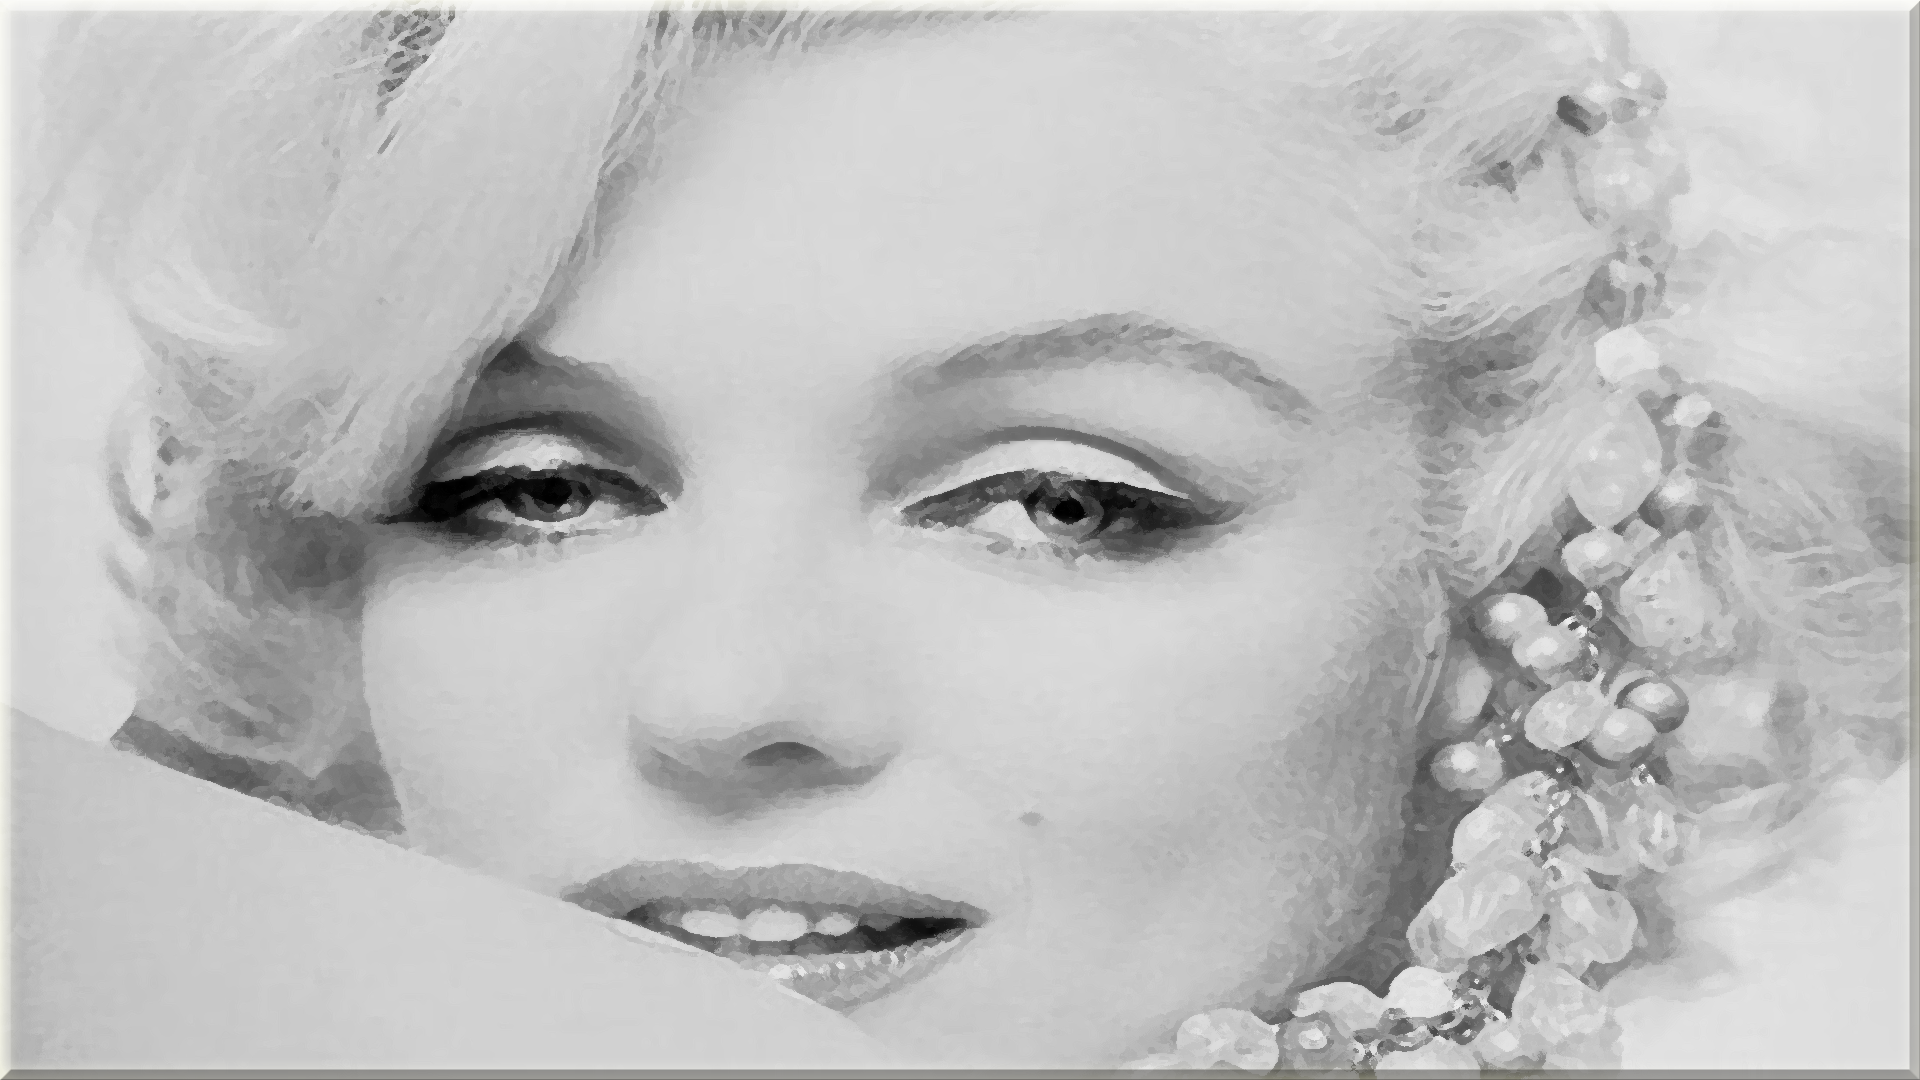 Marilyn monroe paint dabs hd wallpaper background image 1920x1080 id 356367 wallpaper abyss - Marilyn monroe wallpaper download ...